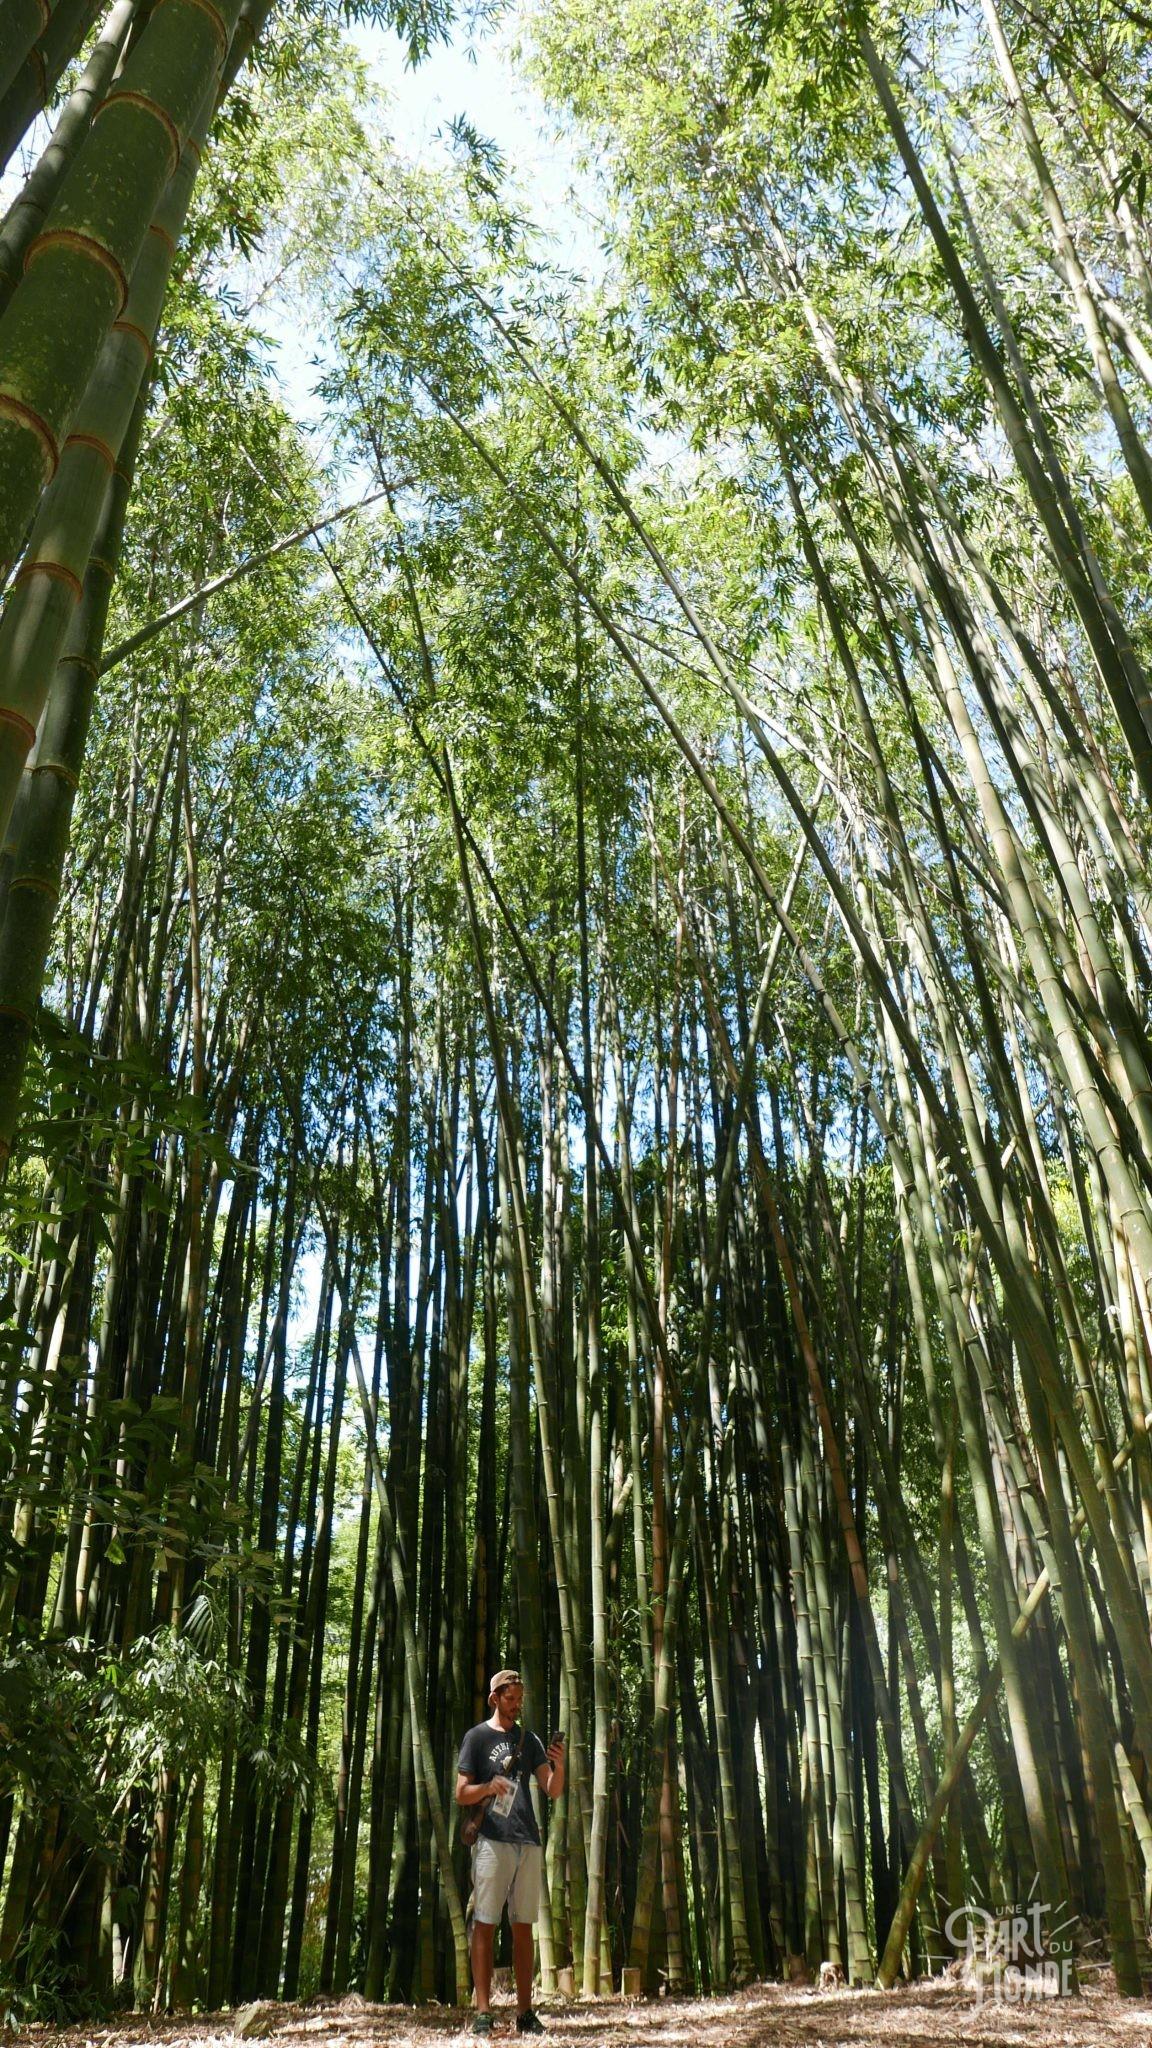 rio de janeiro côté nature jardin botanique bambou